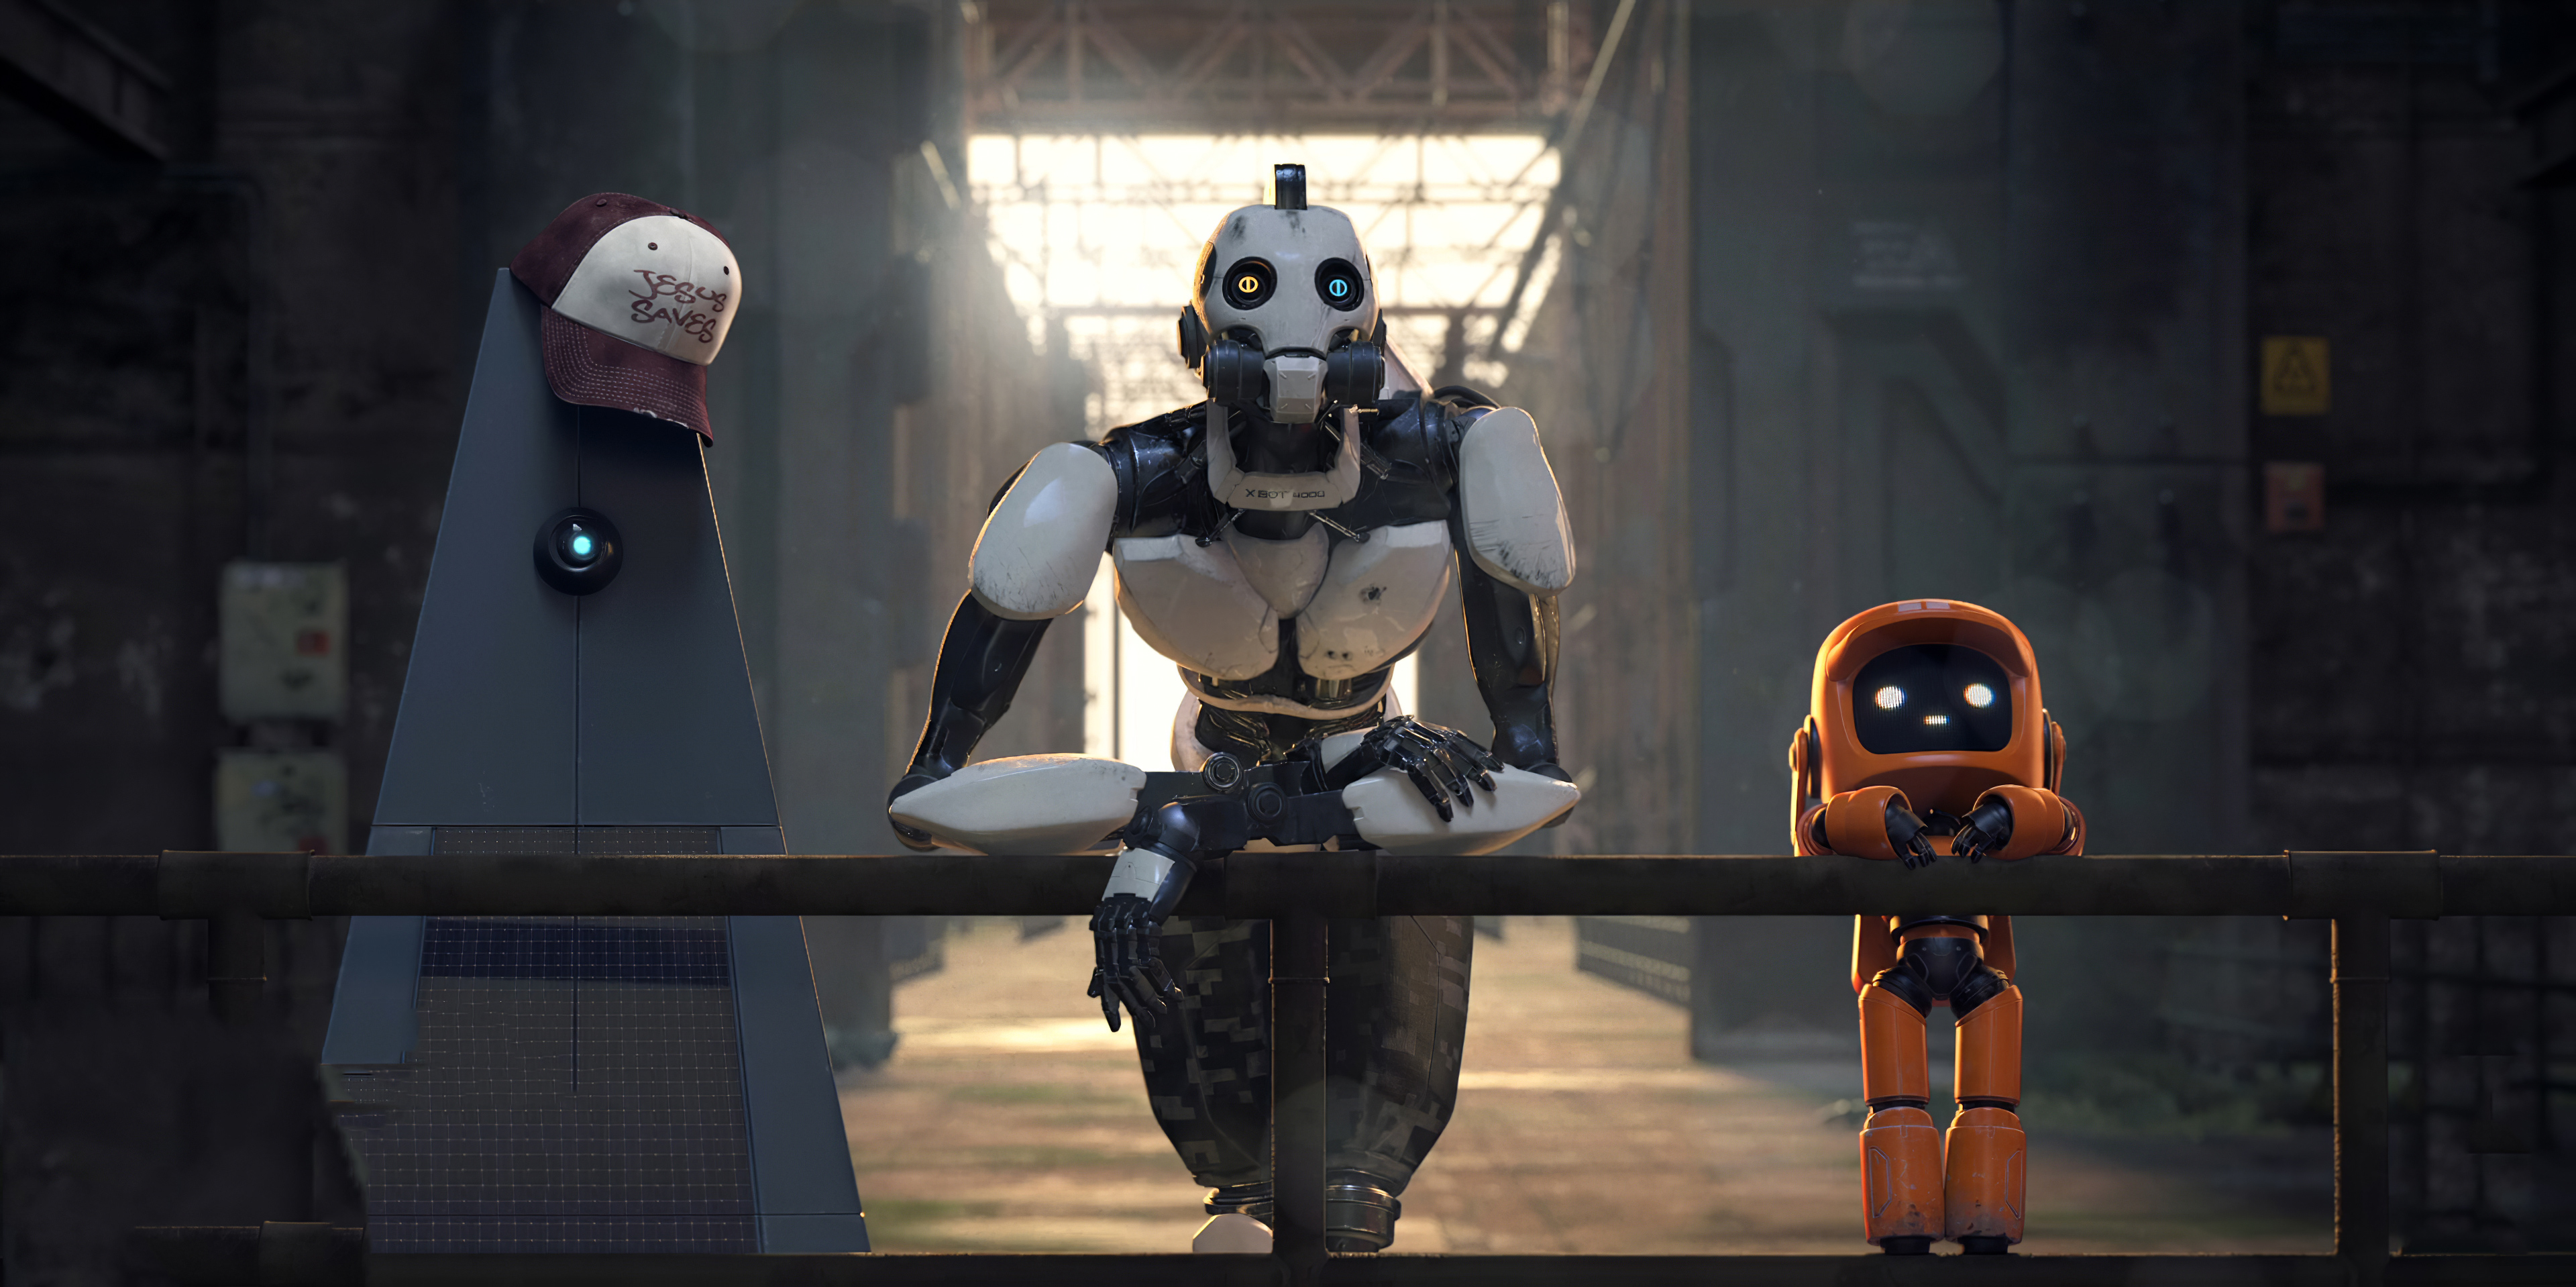 Love Death And Robots Wallpaper, HD TV Series 4K ...